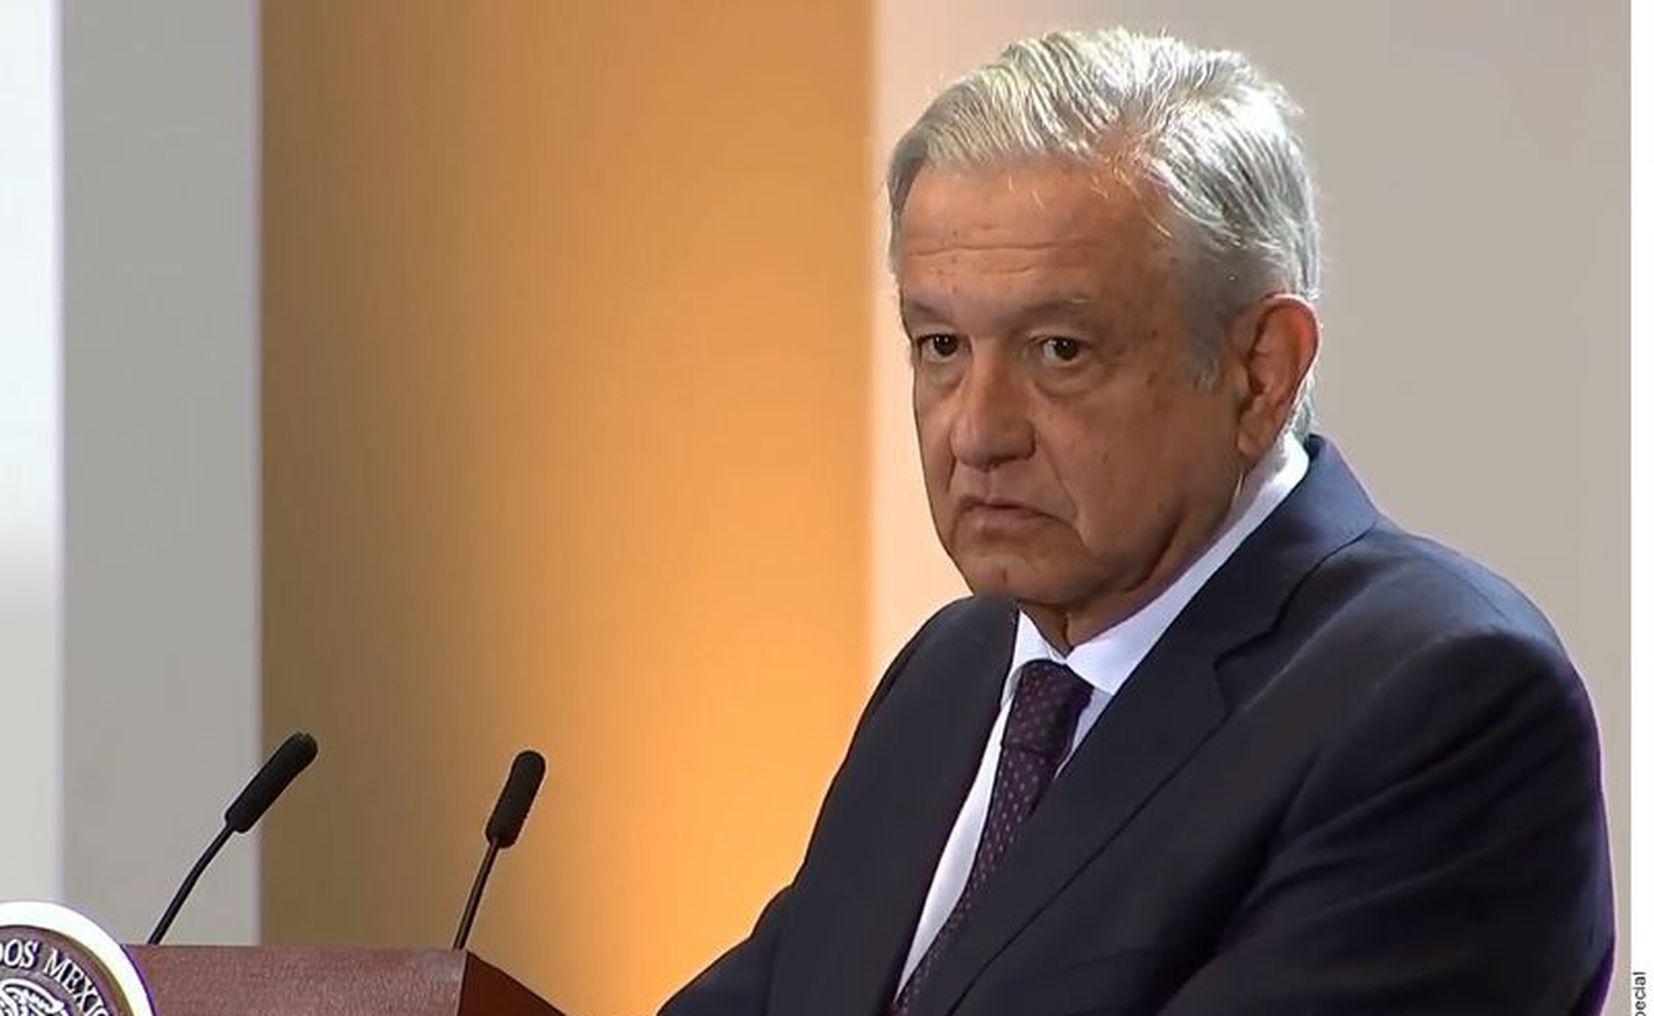 Critica AMLO a WSJ por compararlo con Santa Anna y Porfirio Díaz